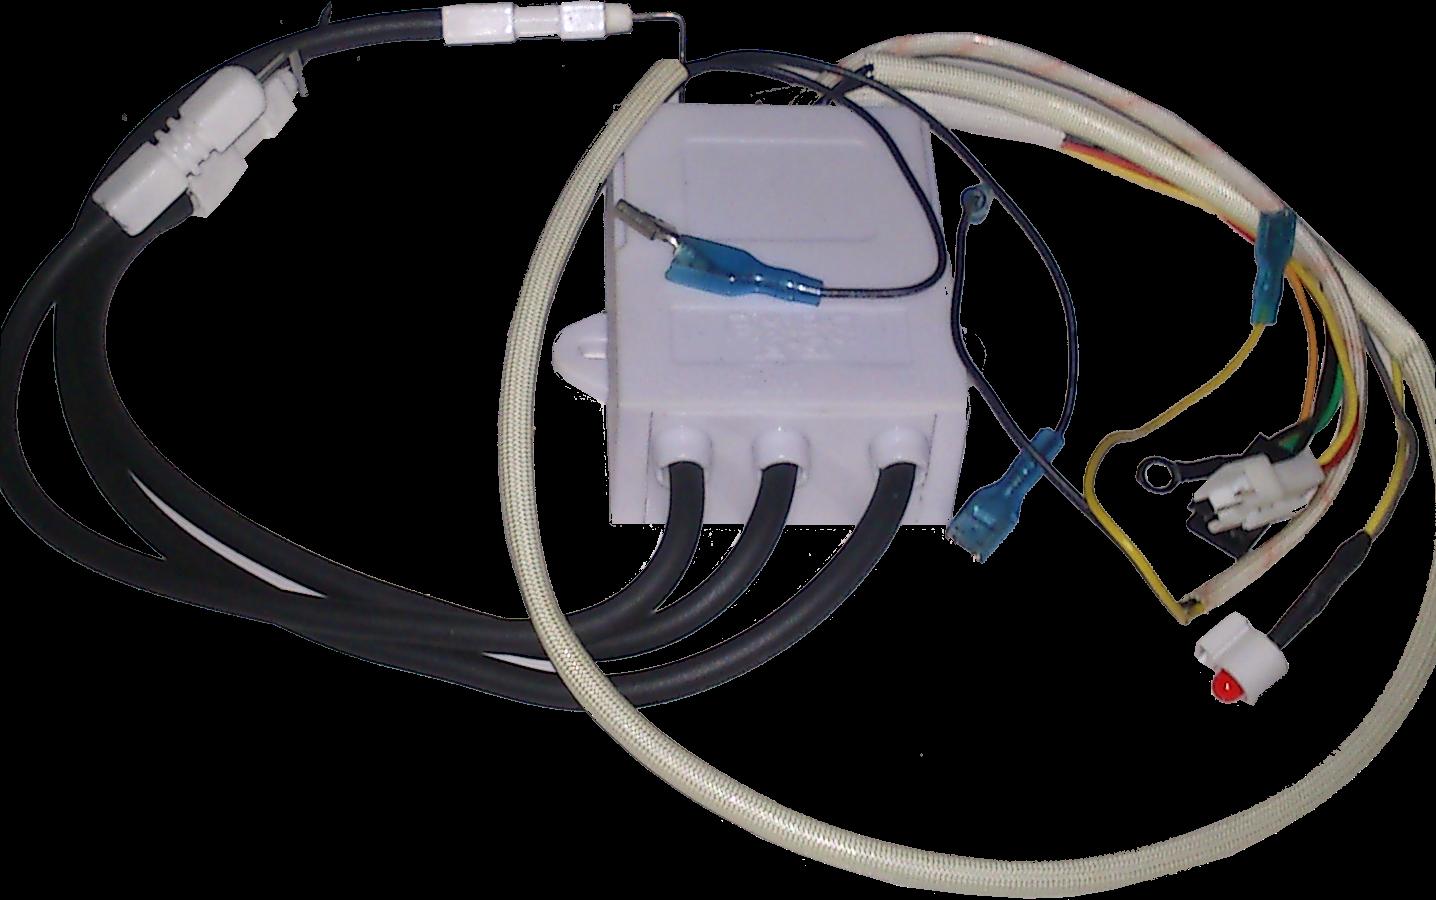 Belajar Sendiri Service Water Heater Gas Cara Mengganti Pemantik Water Heater Gas Controler Pulse Igniter